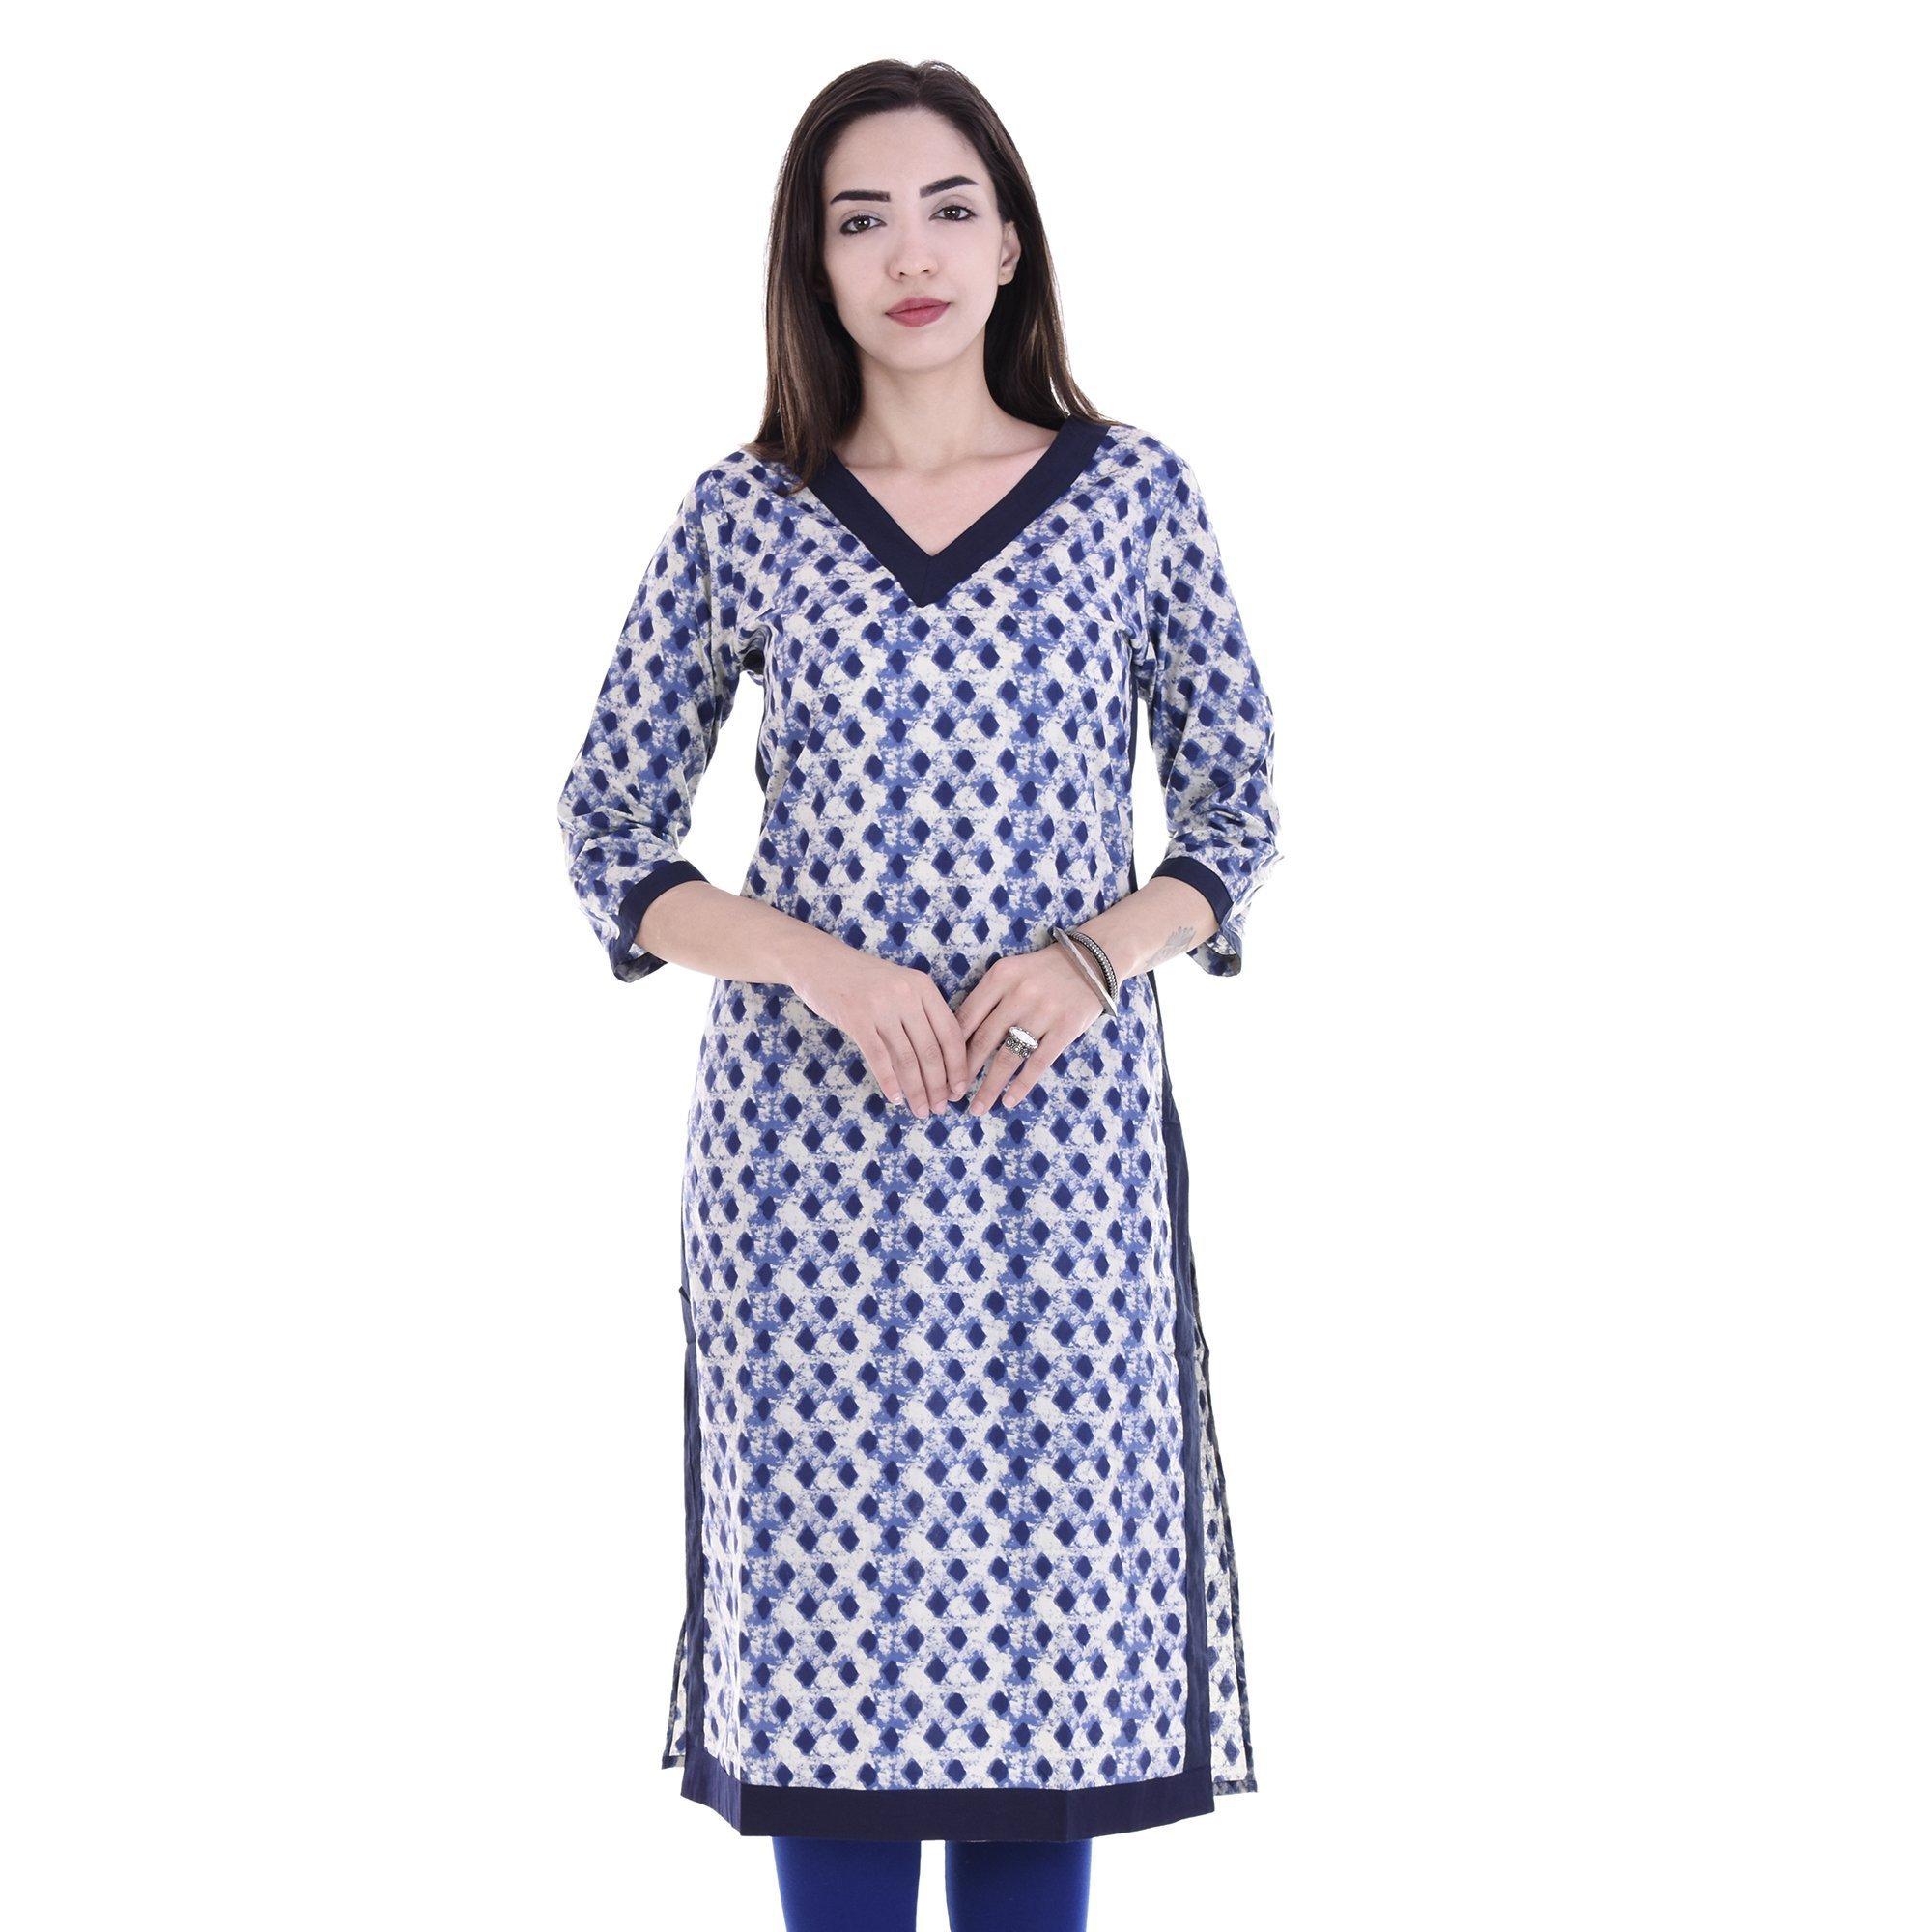 Chichi Indian Women Kurta Kurti 3/4 Sleeve X-Large Size Printed Straight Blue Top